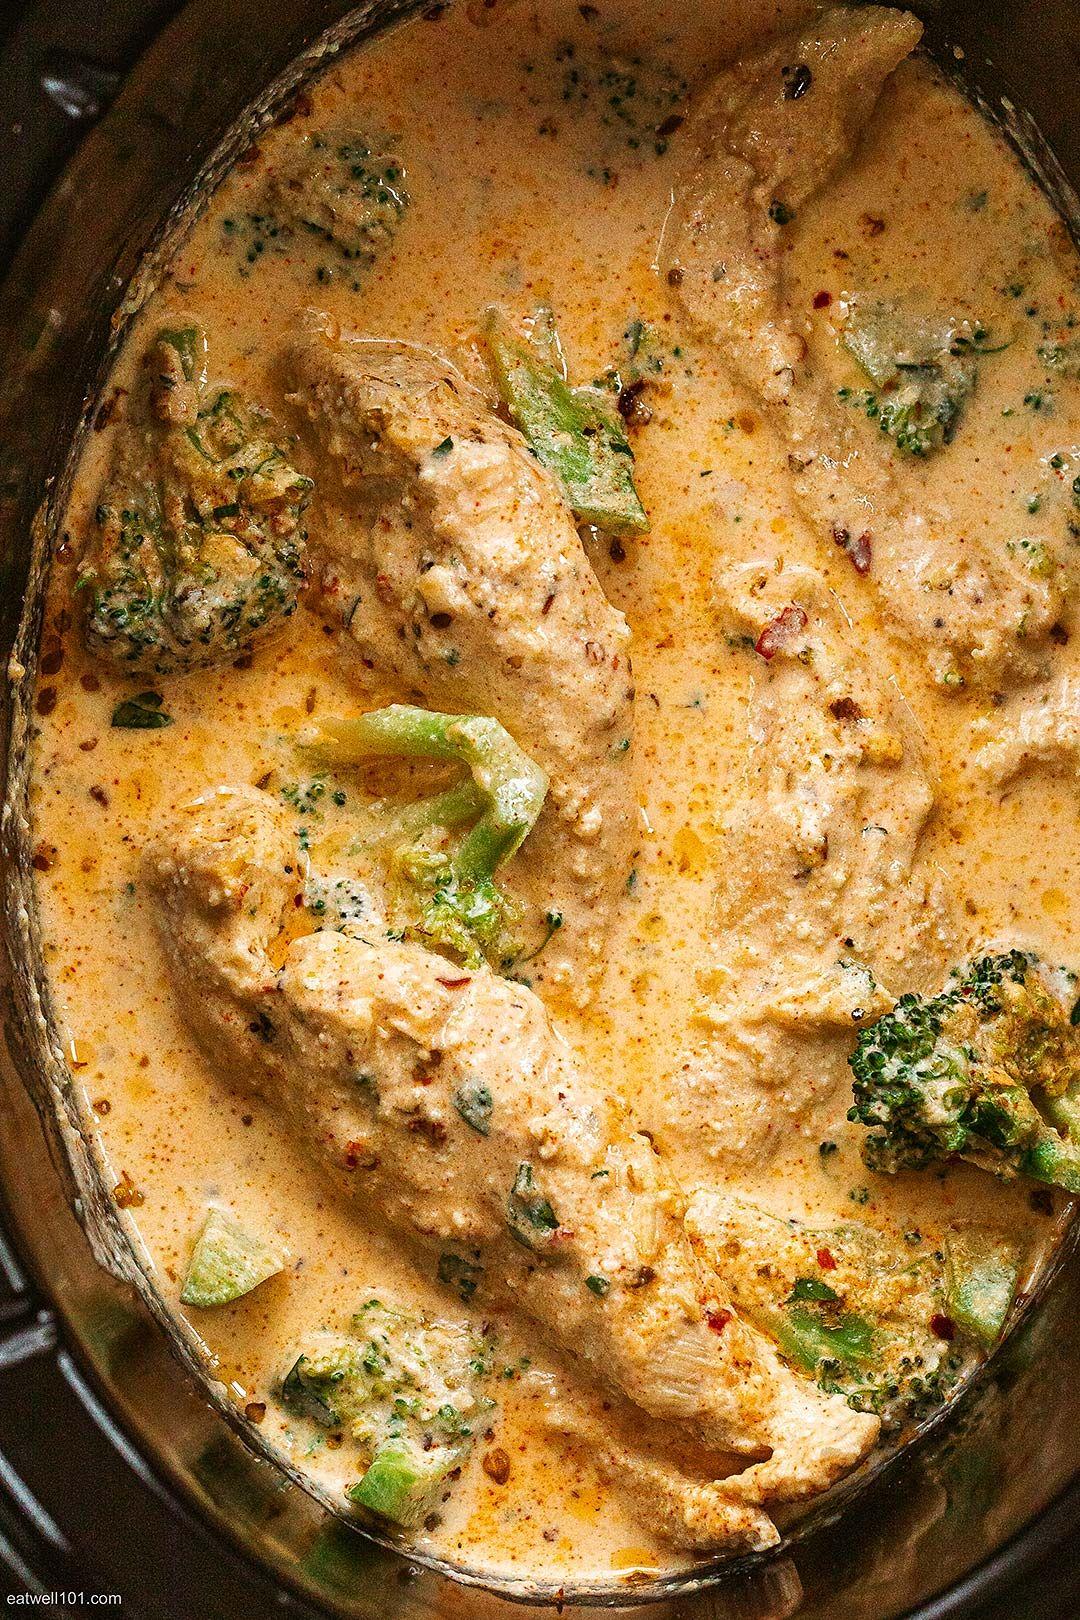 Photo of Slow Cooker Garlic Chicken Alfredo with Broccoli